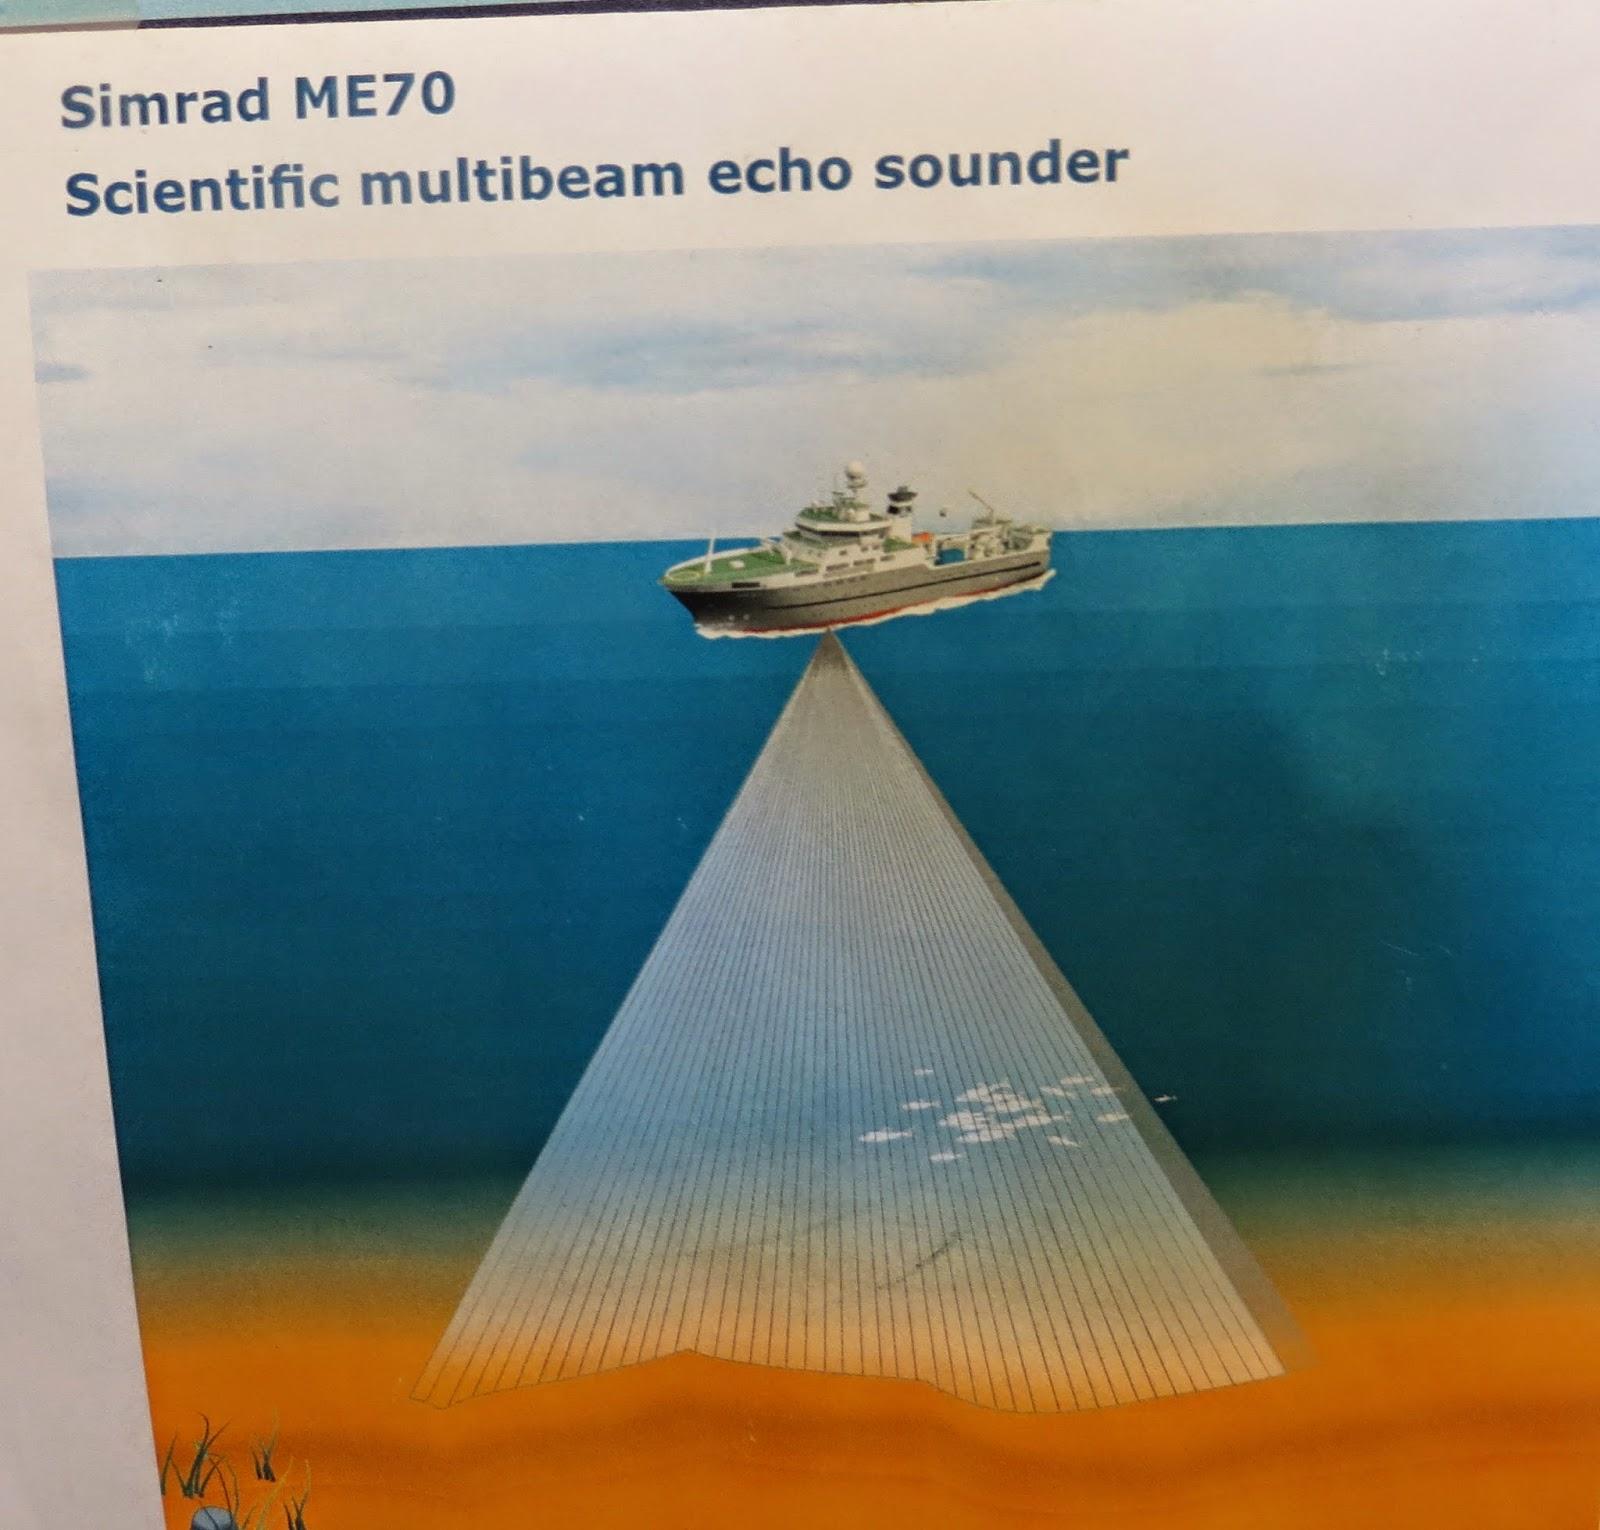 Simrad ME70